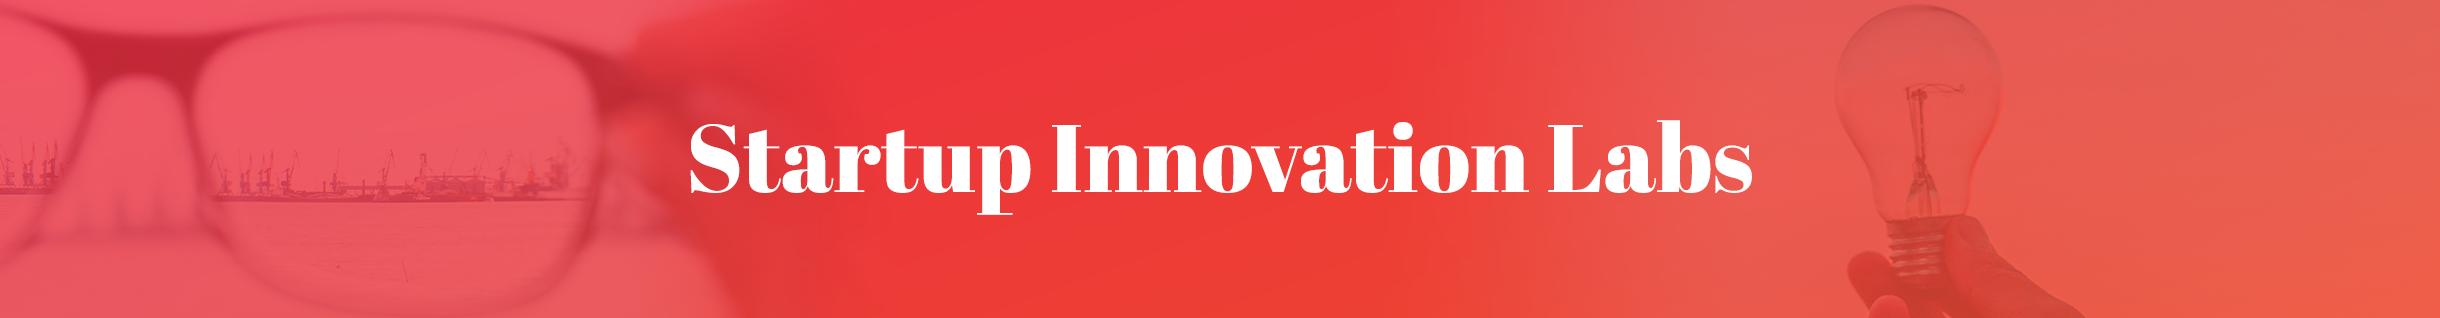 Startup Innovation Labs